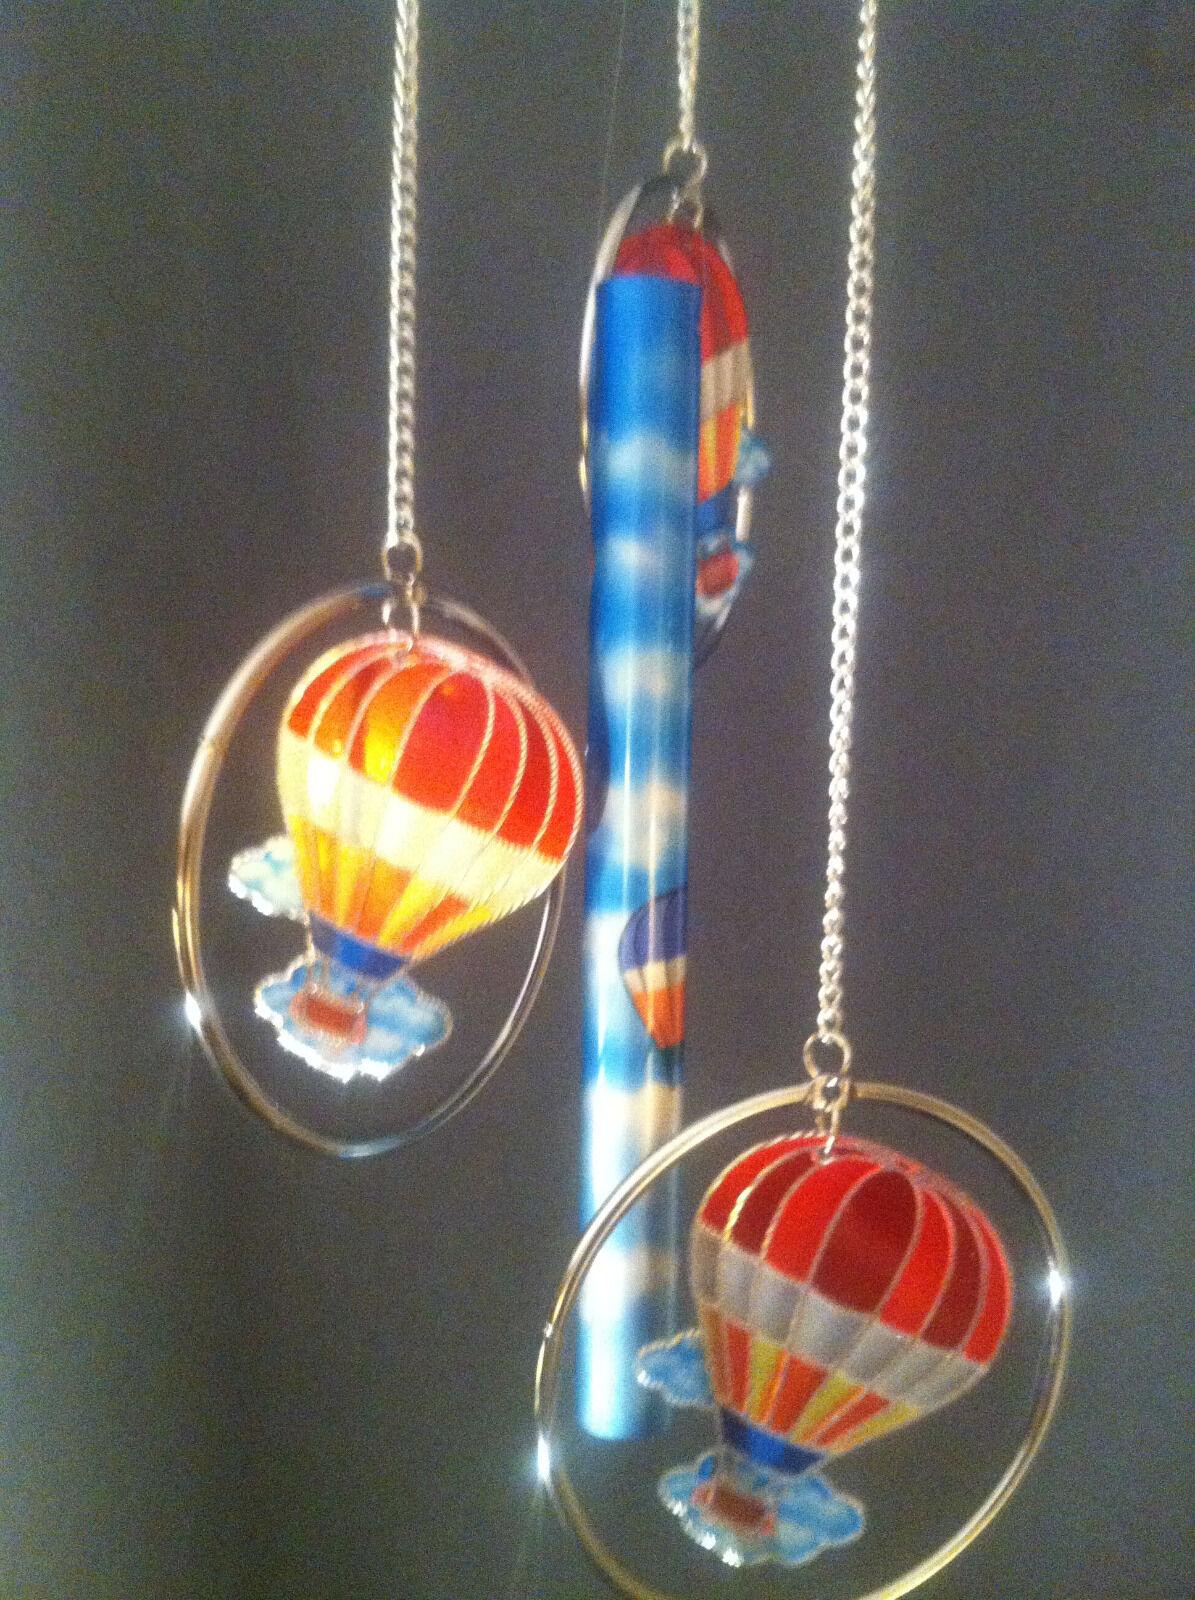 Cadona 3-Ring Aluminum Decorative Multicolor Hot Air Ballooons Wind Chime